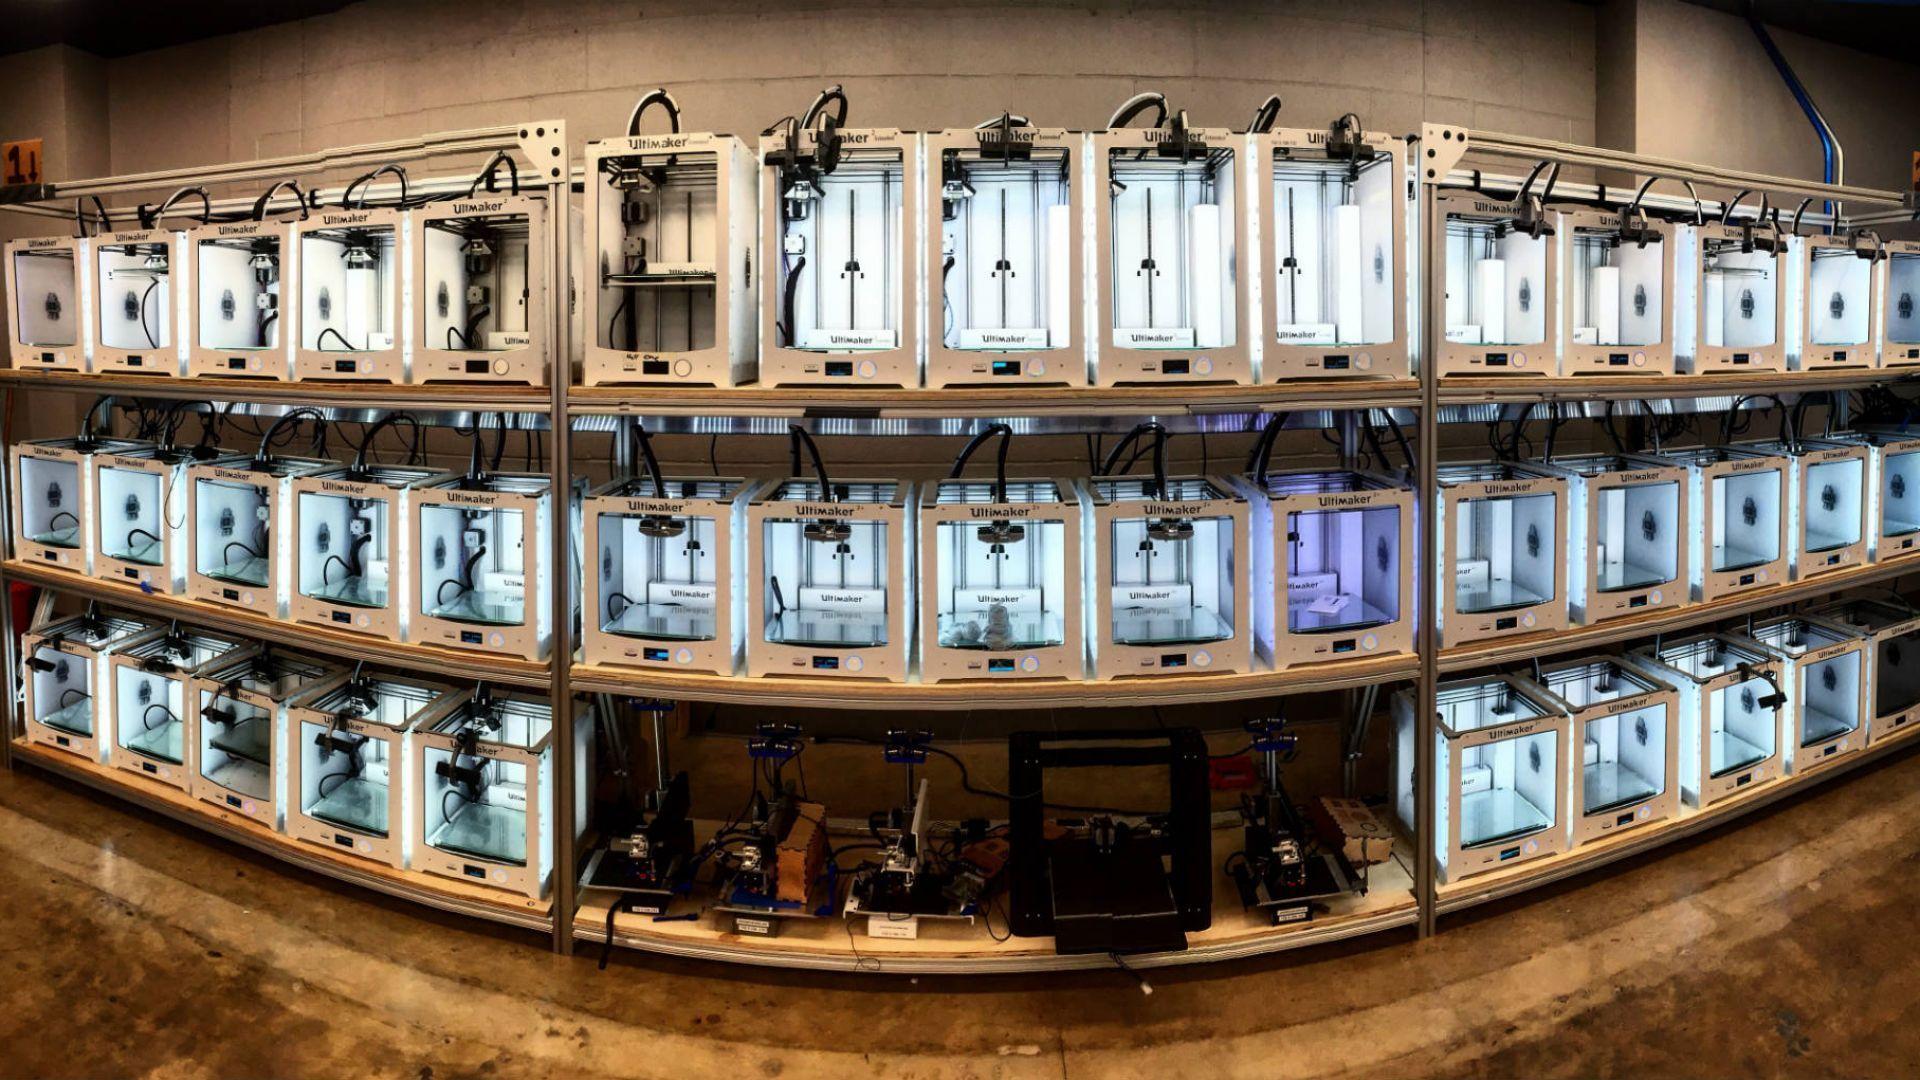 Ferma de imprimante 3D